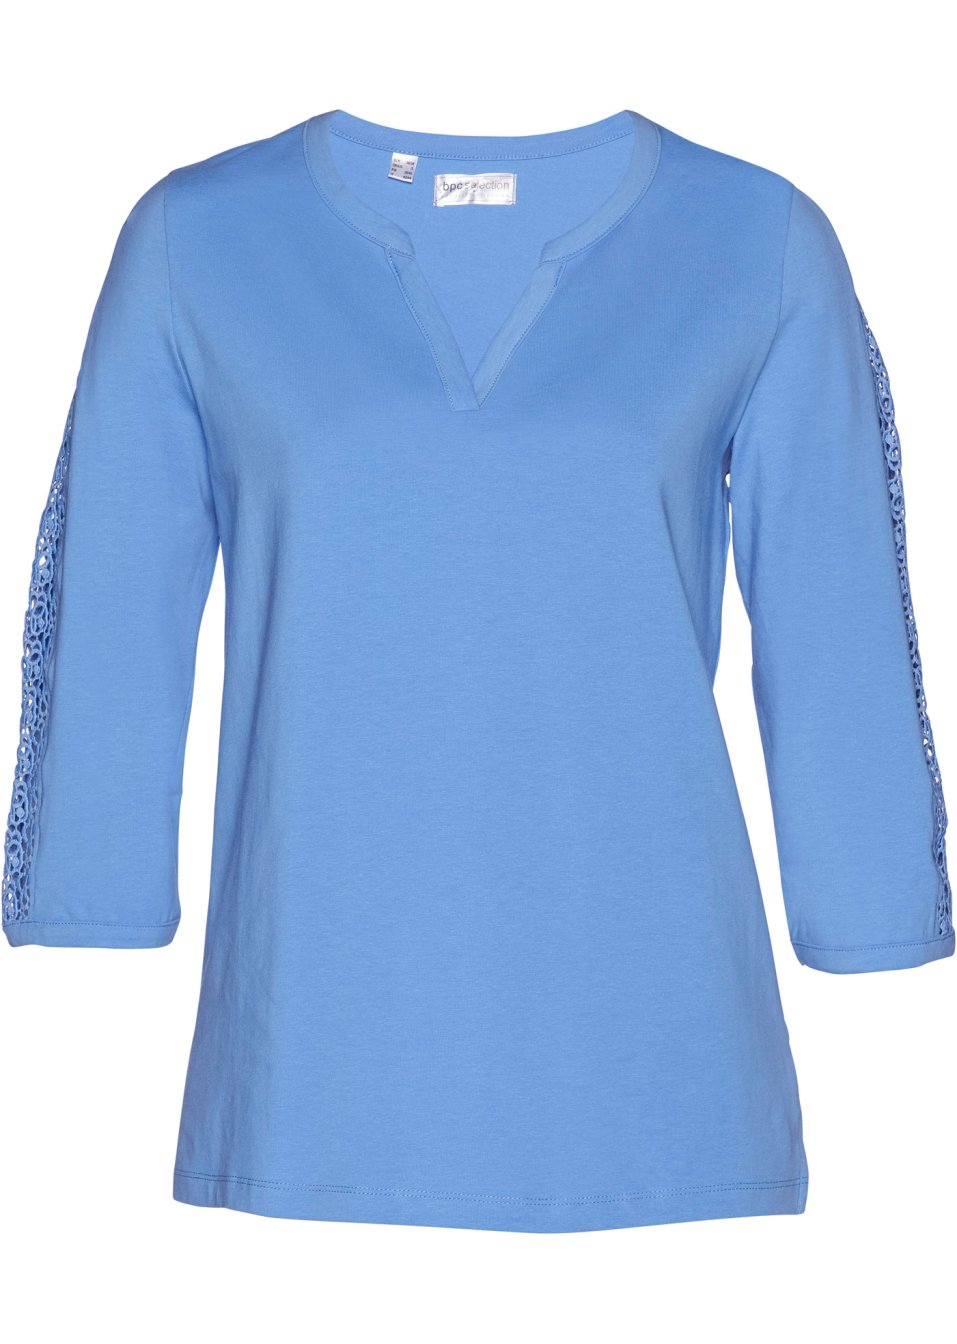 3/4-A-Shirt mittelblau - bpc selection premium - bonprix.de Ng2uv d2rAR